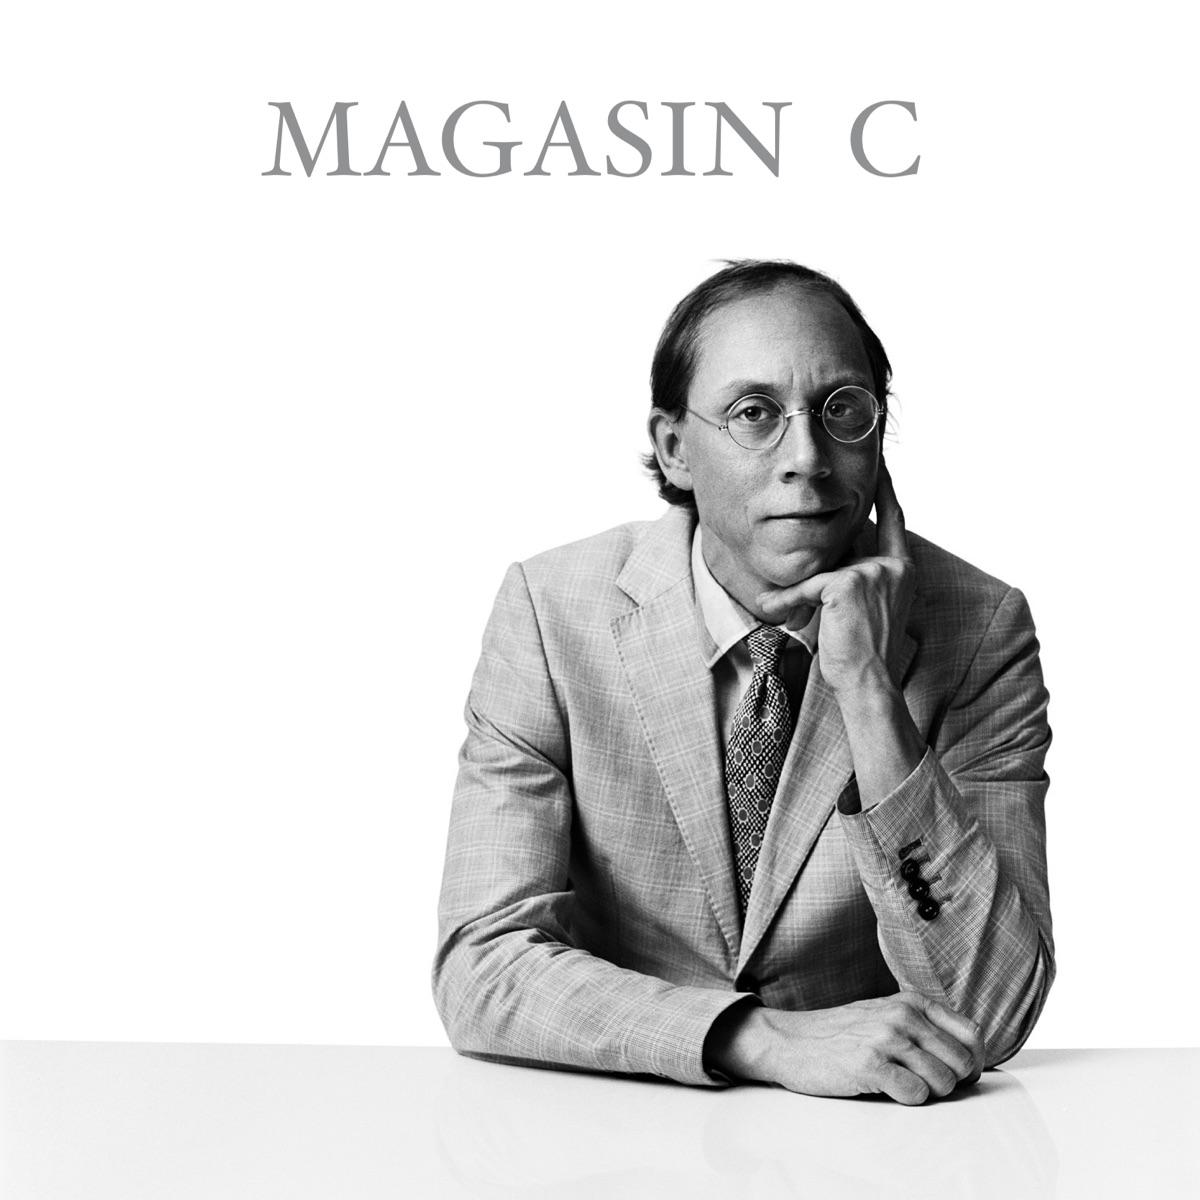 Magasin C